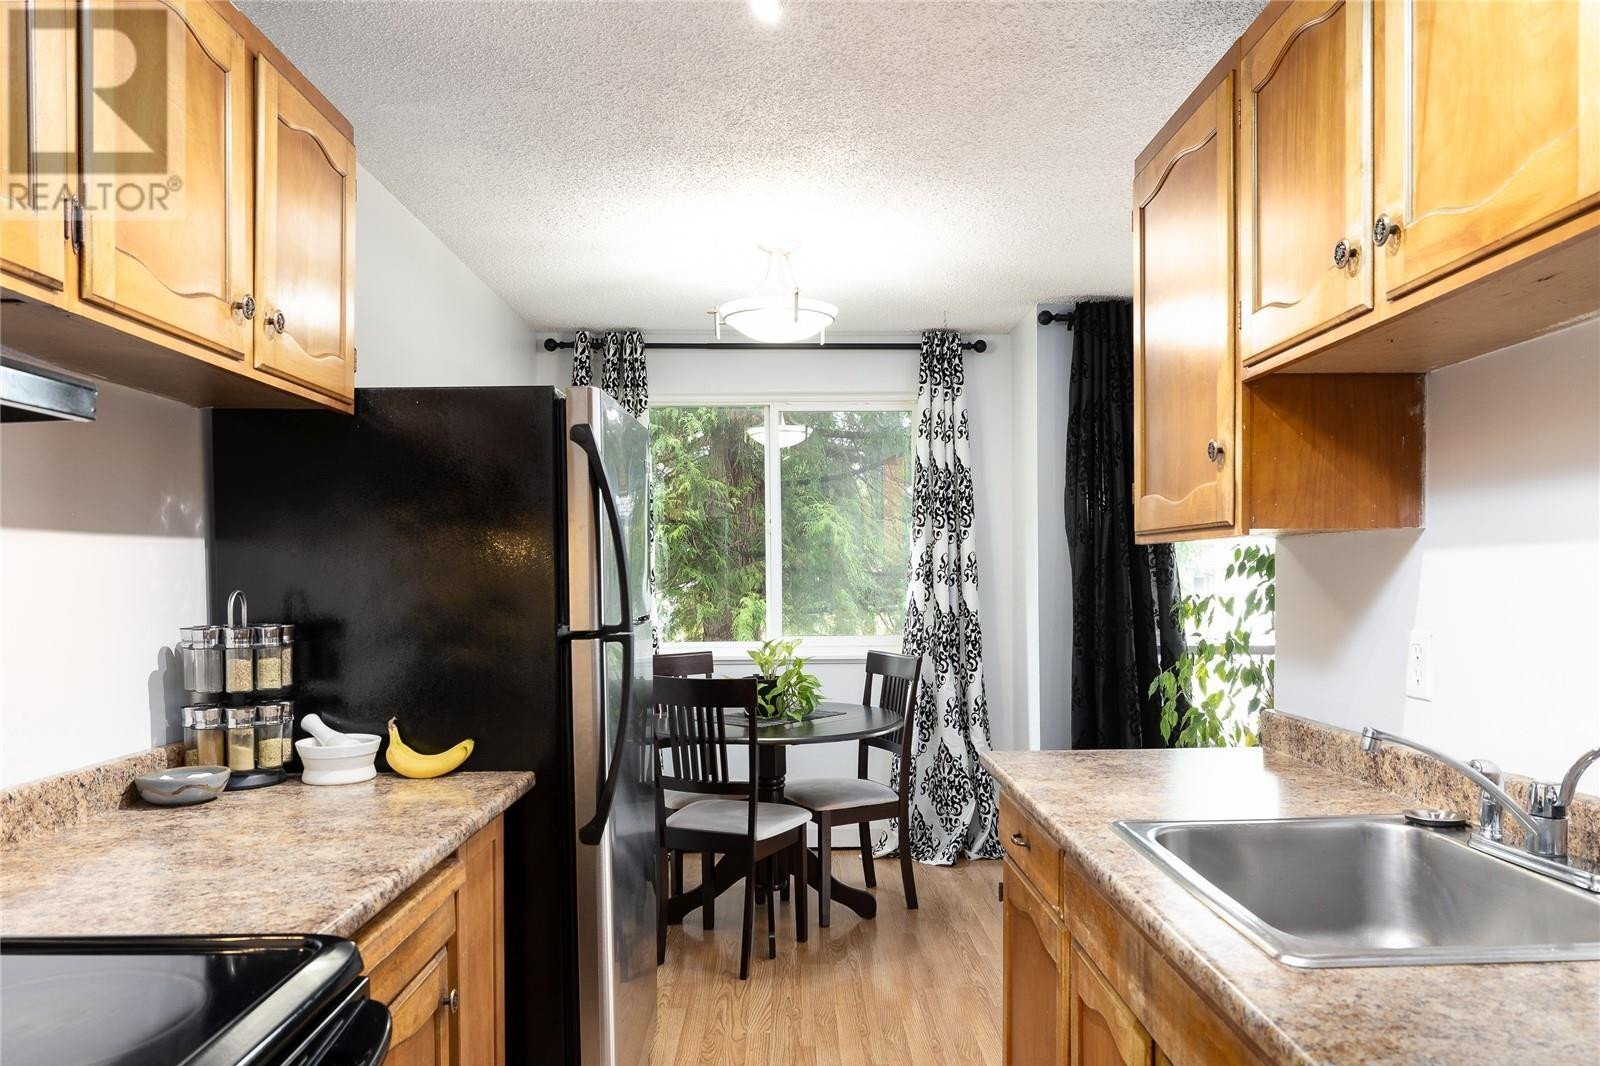 Condo for sale at 995 Bowen Rd Unit 3208 Nanaimo British Columbia - MLS: 860266